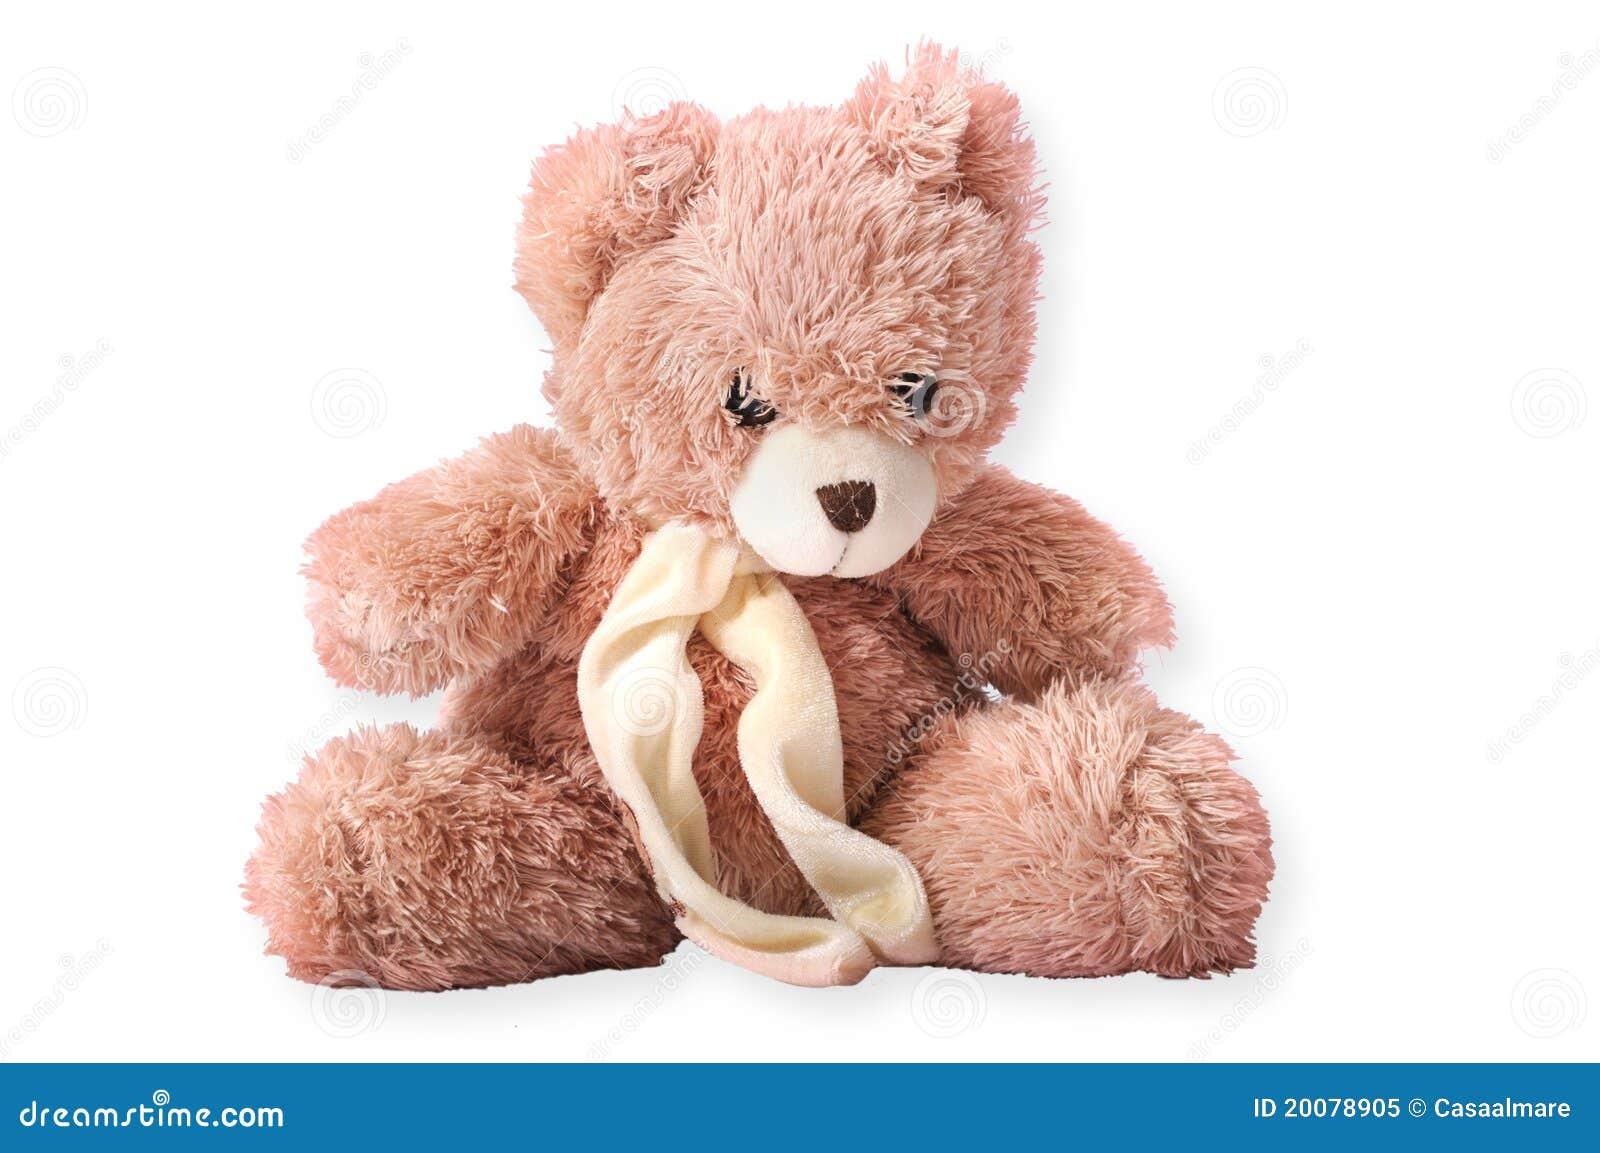 Case Design tatty teddy phone case : Fluff Bear for Pinterest